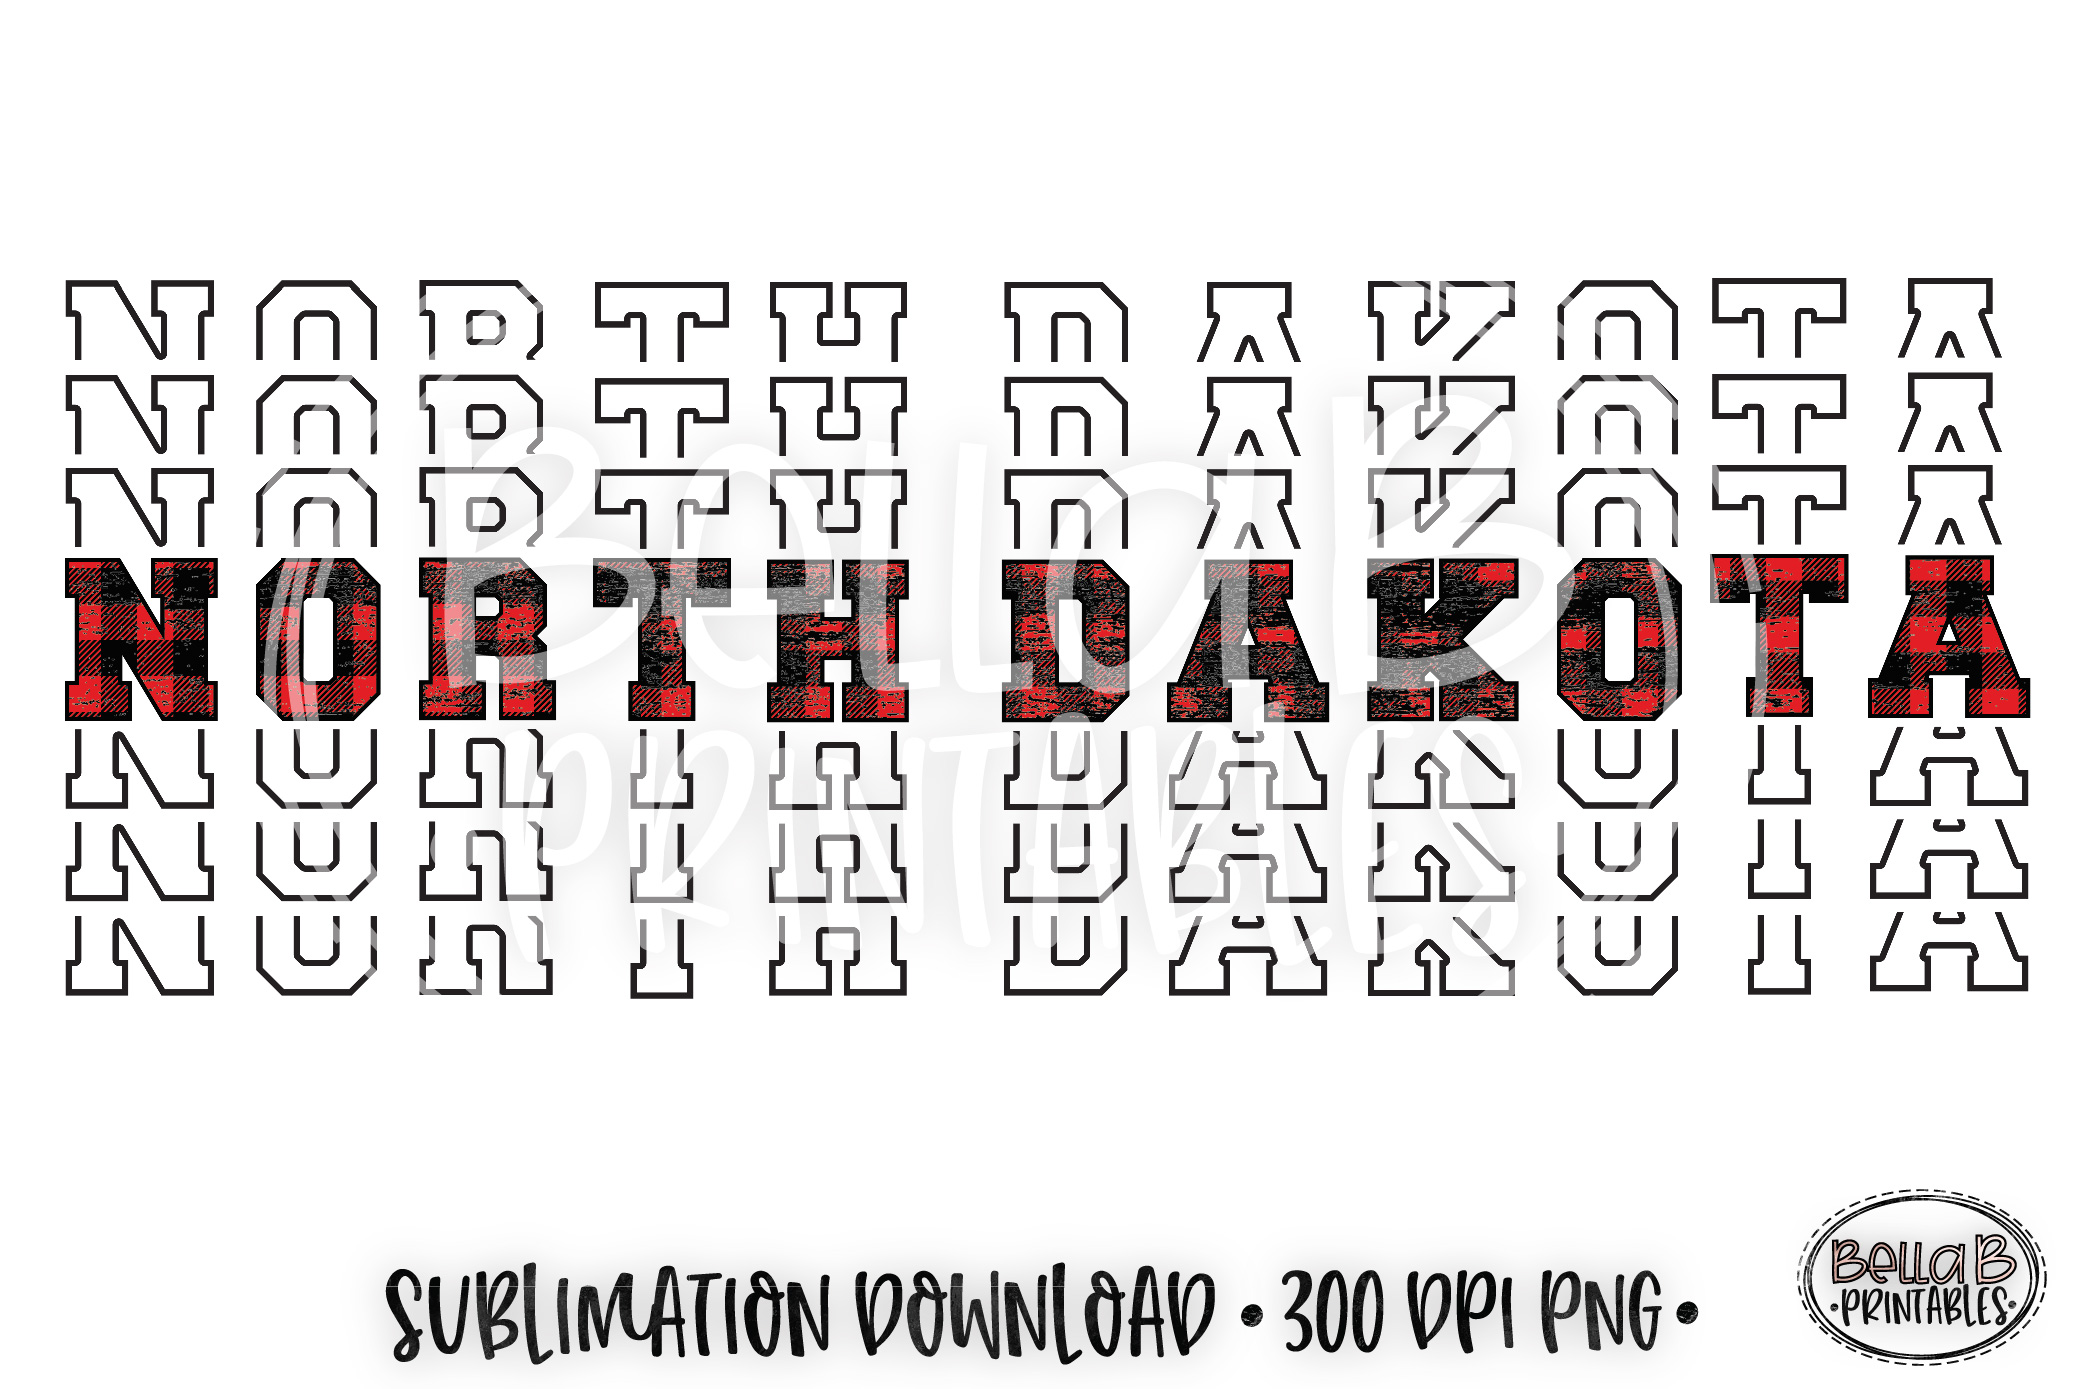 North Dakota Sublimation Design, Buffalo Plaid, Mirrored example image 1